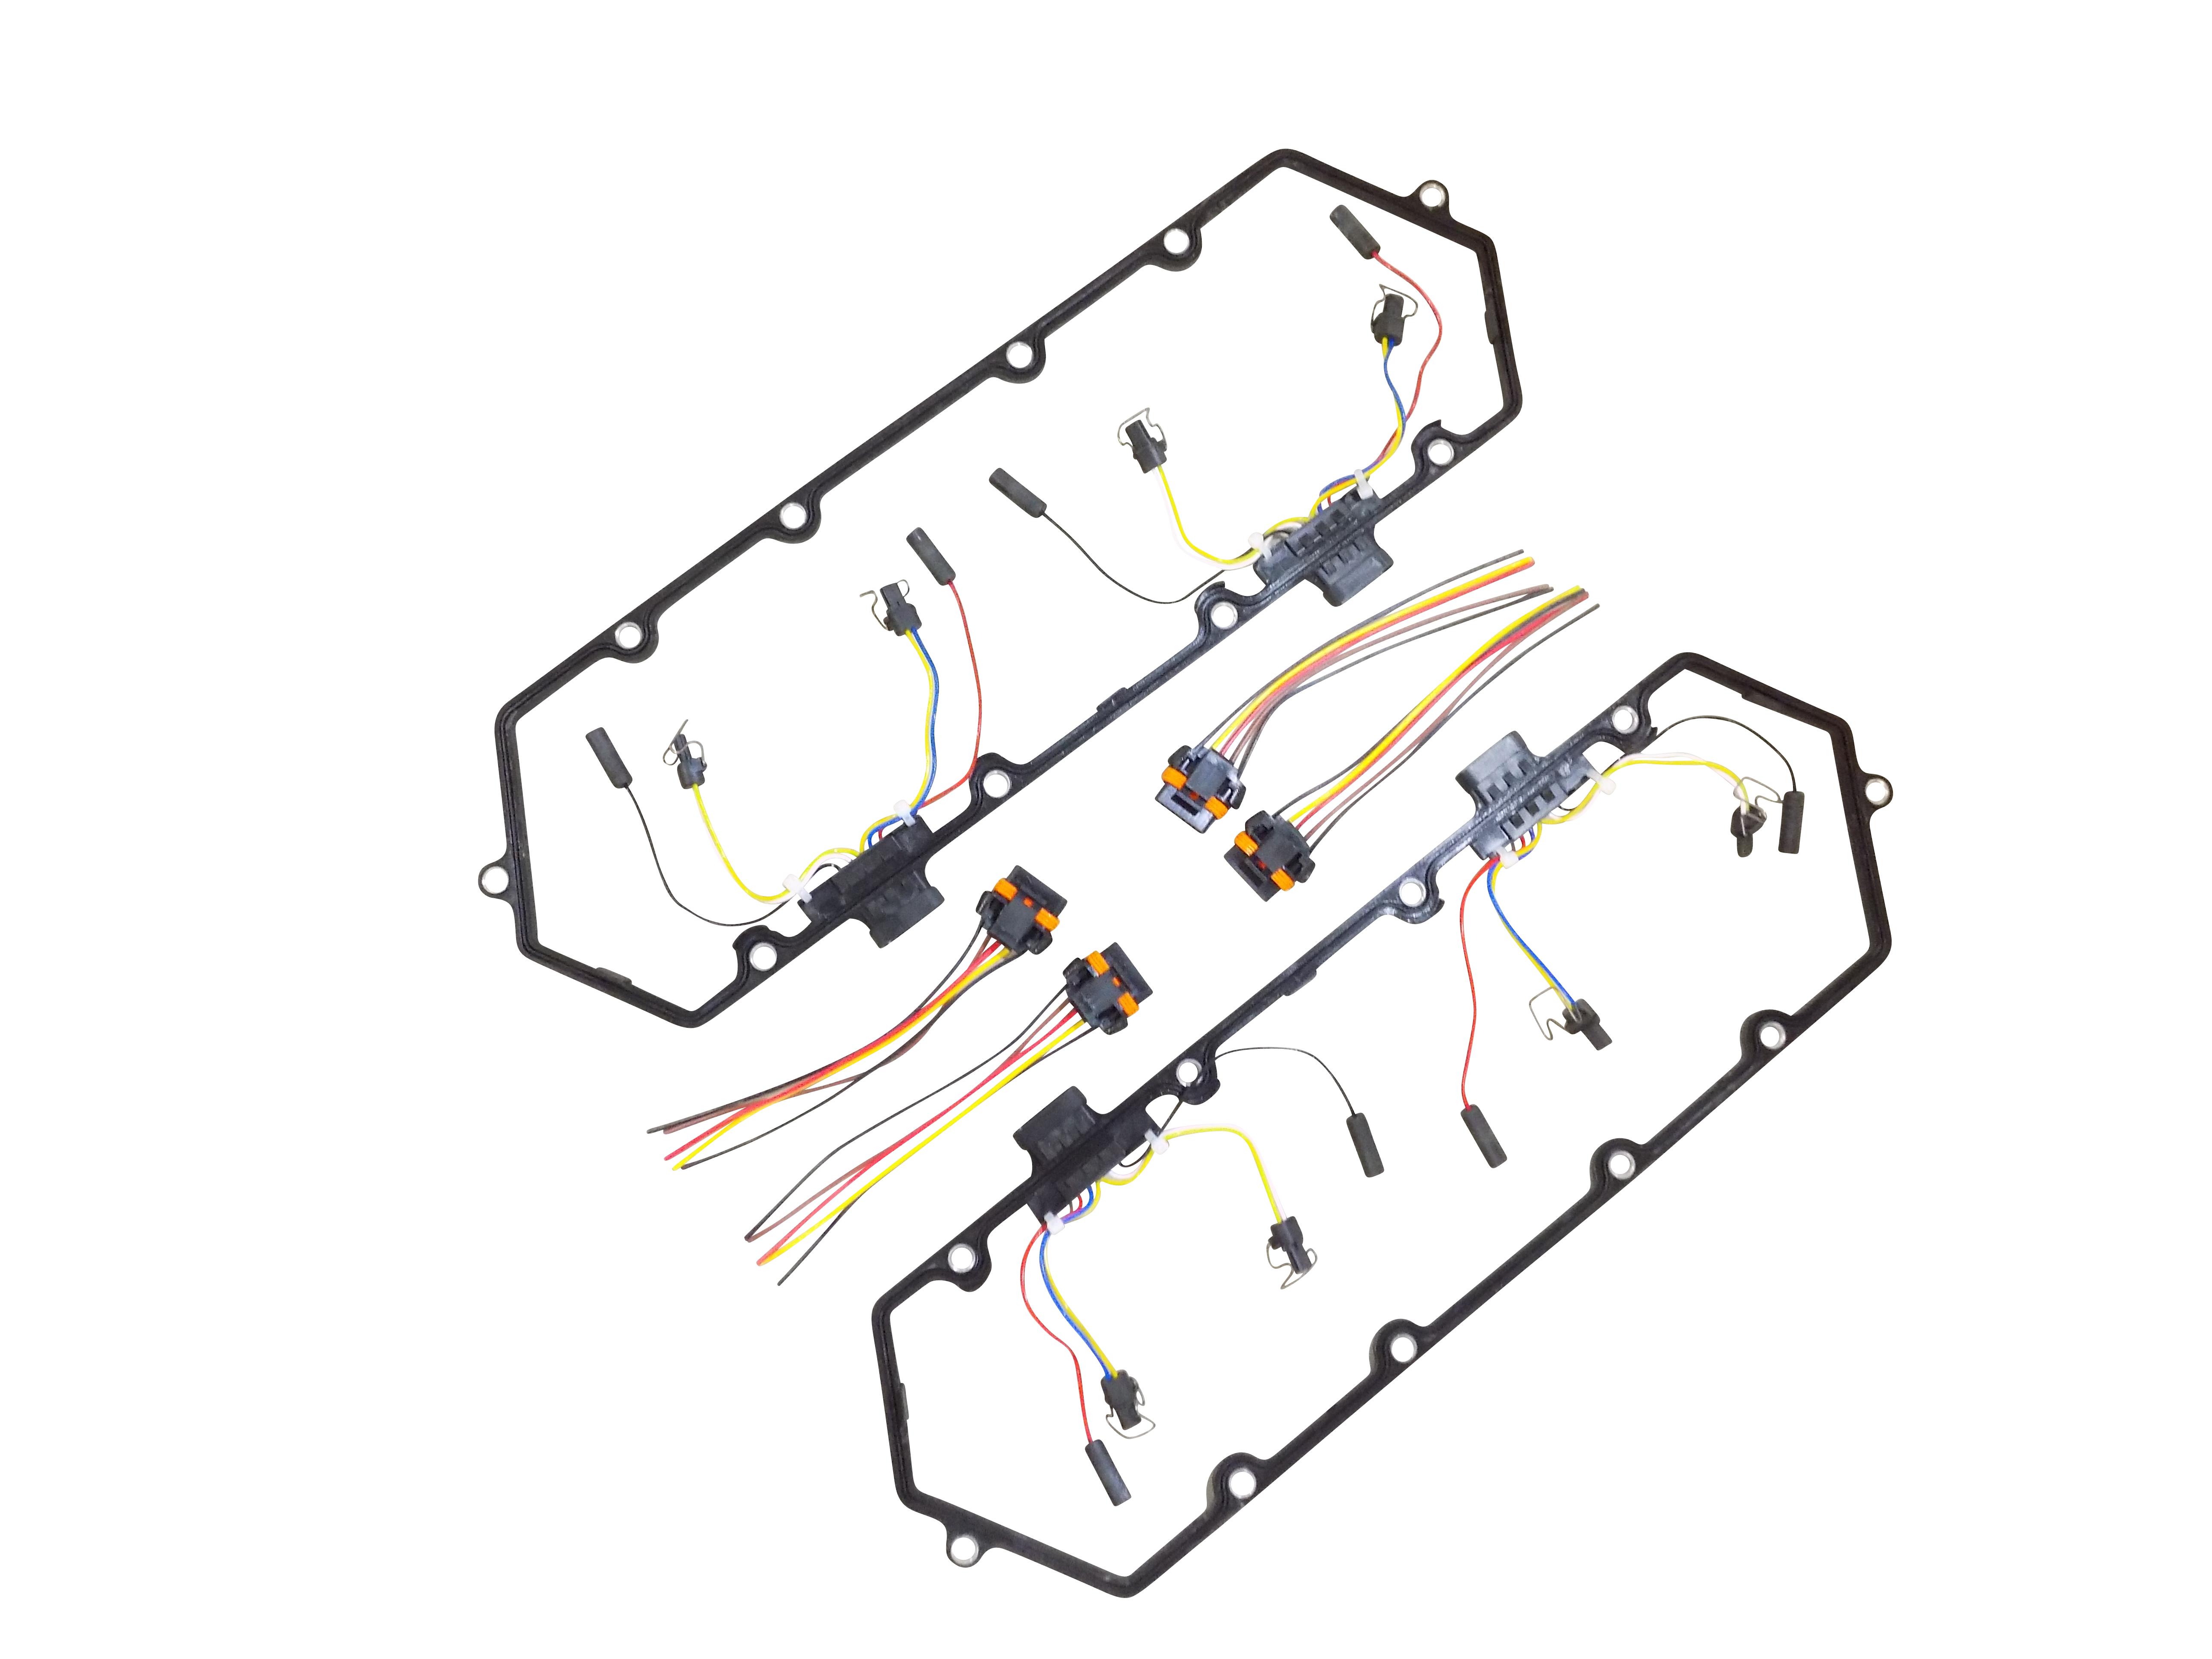 Valve Cover Gasket Set Wiring Pigtail Harnesses W Connectors 73l Automotive Harness Pigtails 1994 97